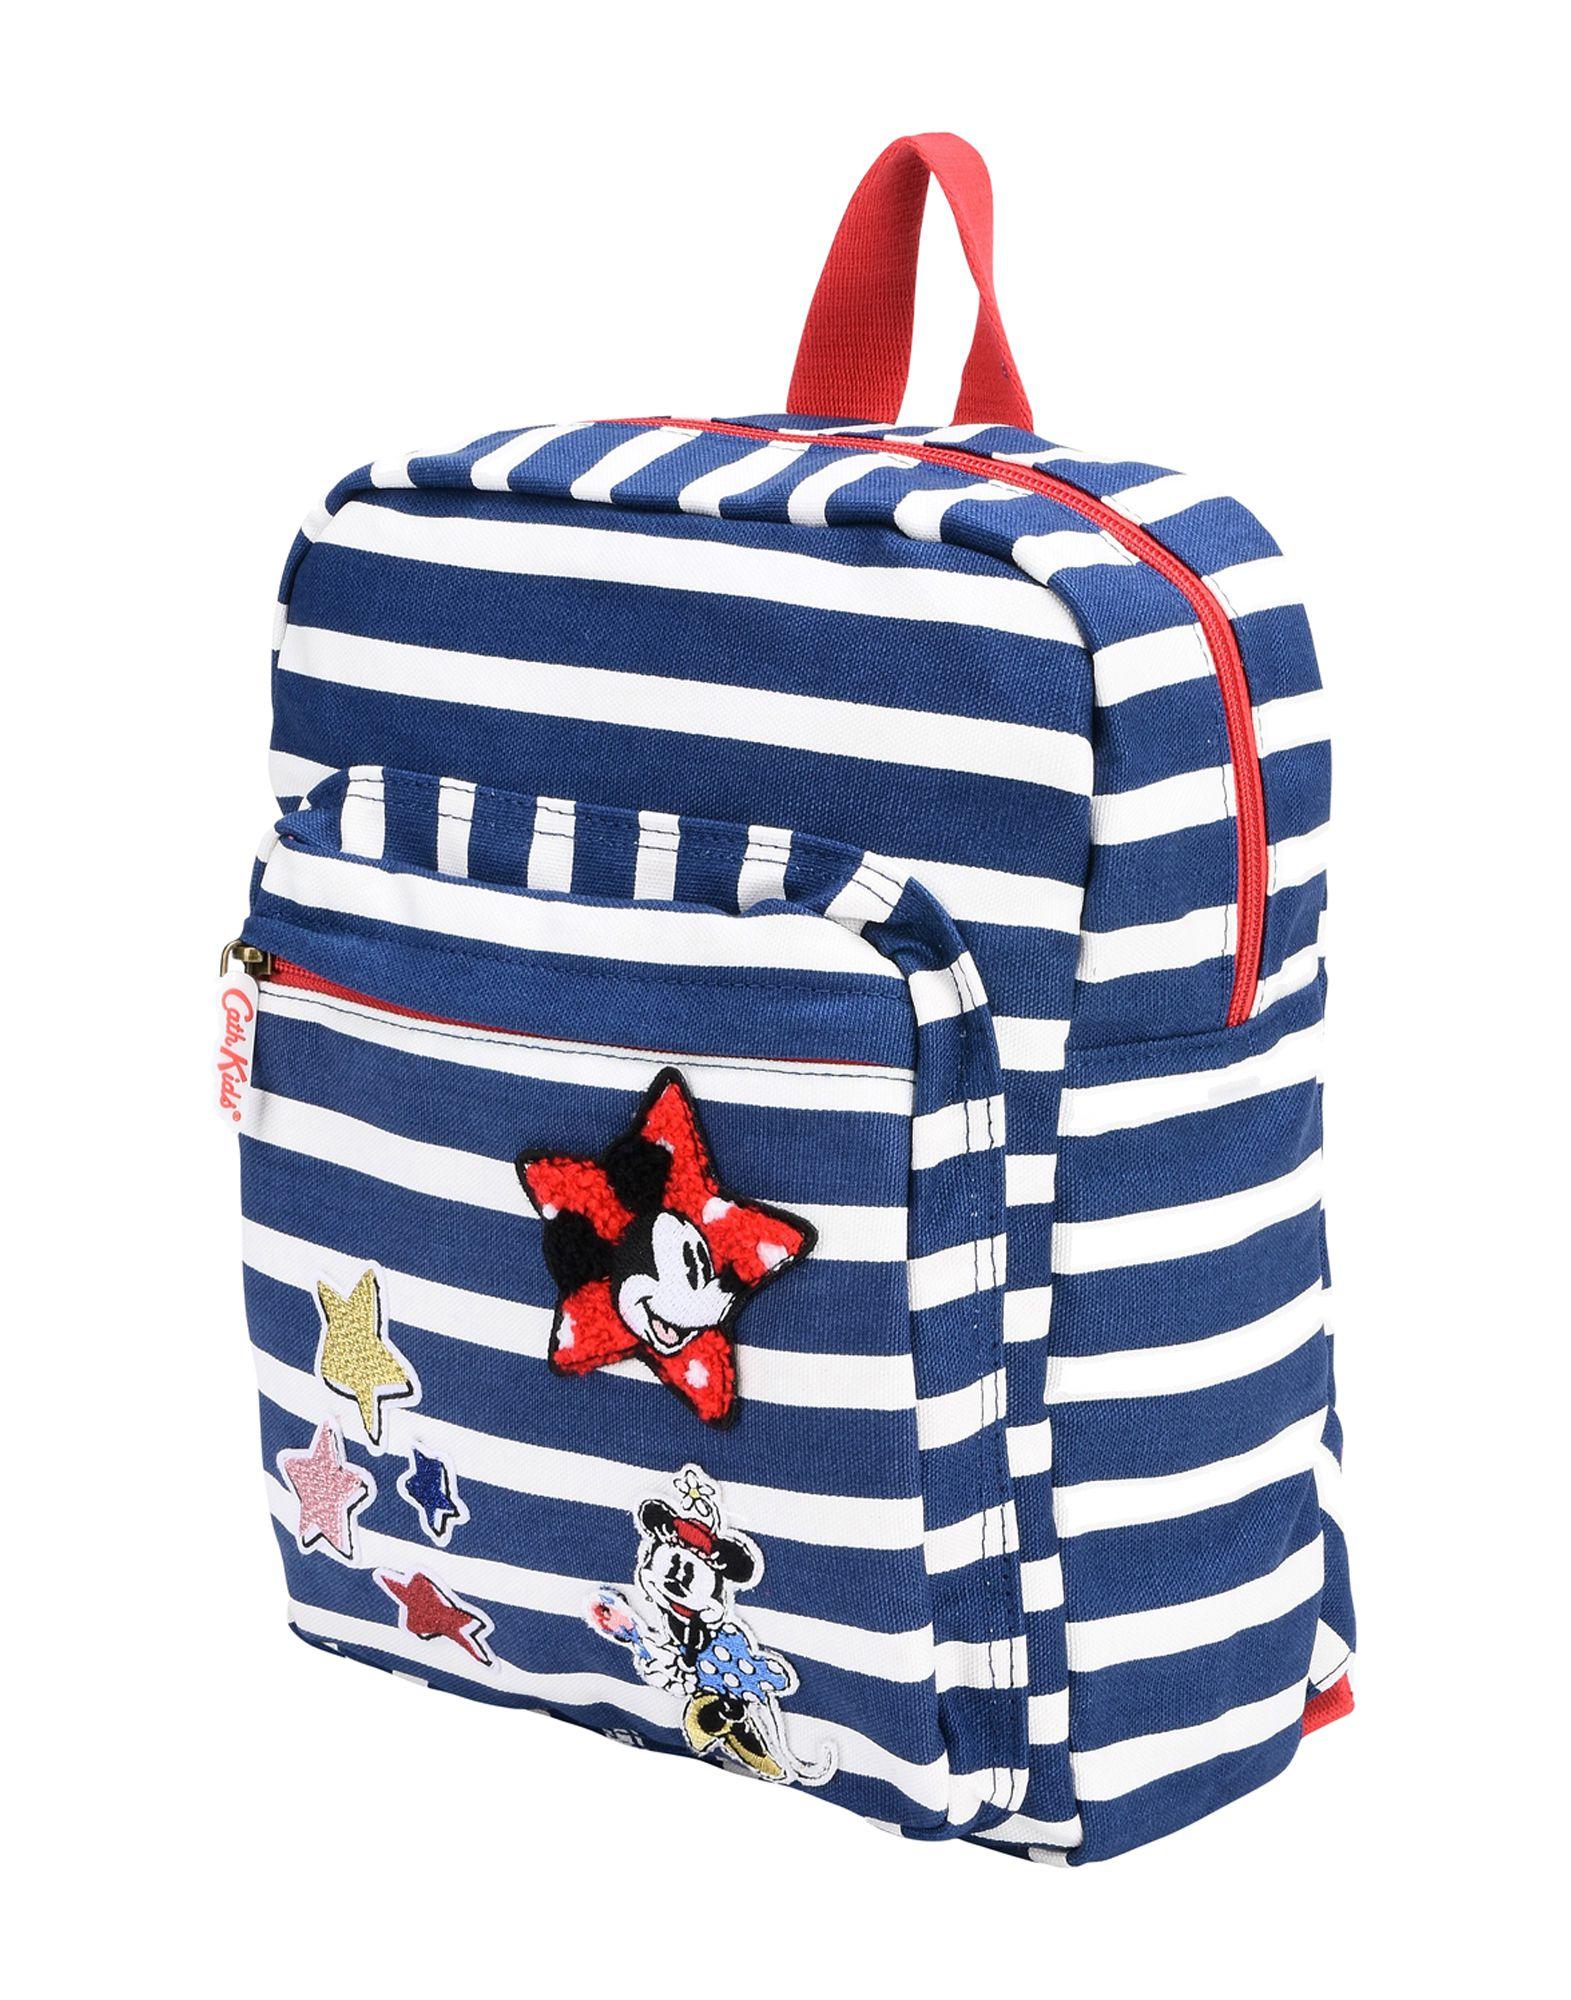 CATH KIDSTON x DISNEY Рюкзаки и сумки на пояс cath kidston iphone 5 купить в спб